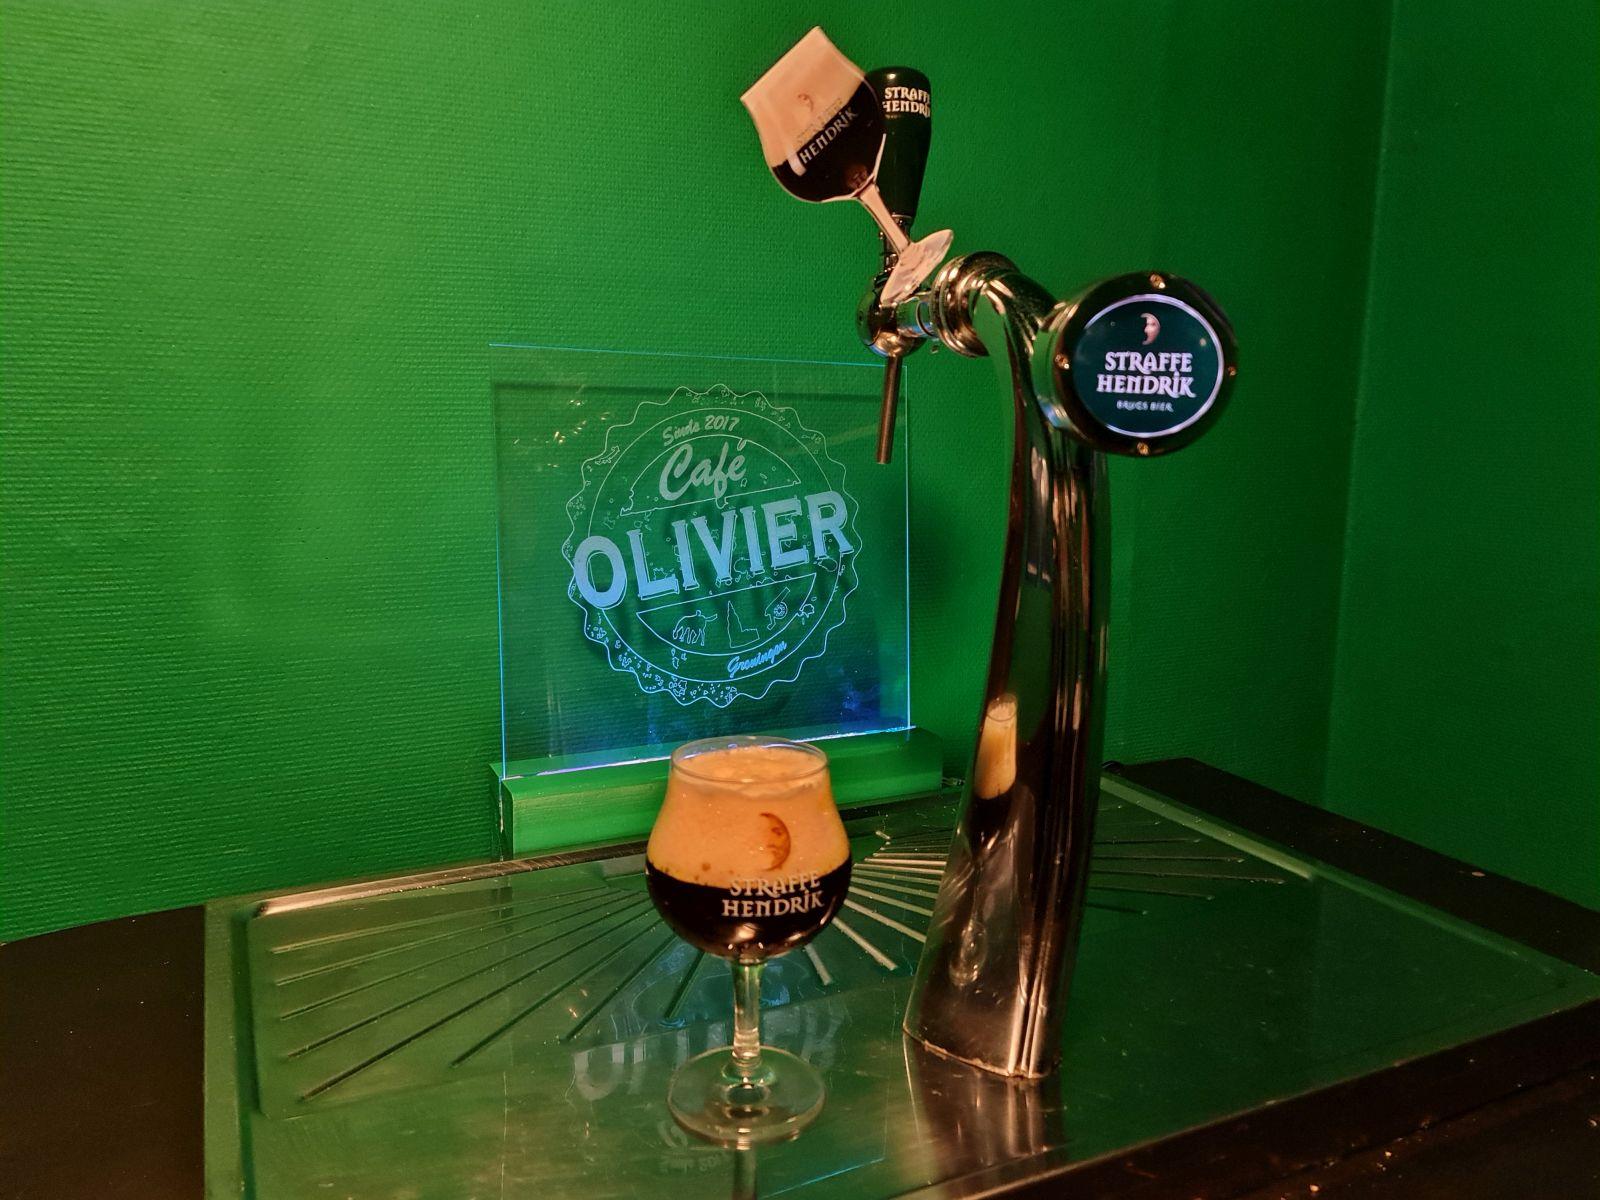 Straffe Hendrik Quadrupel - Café Olivier